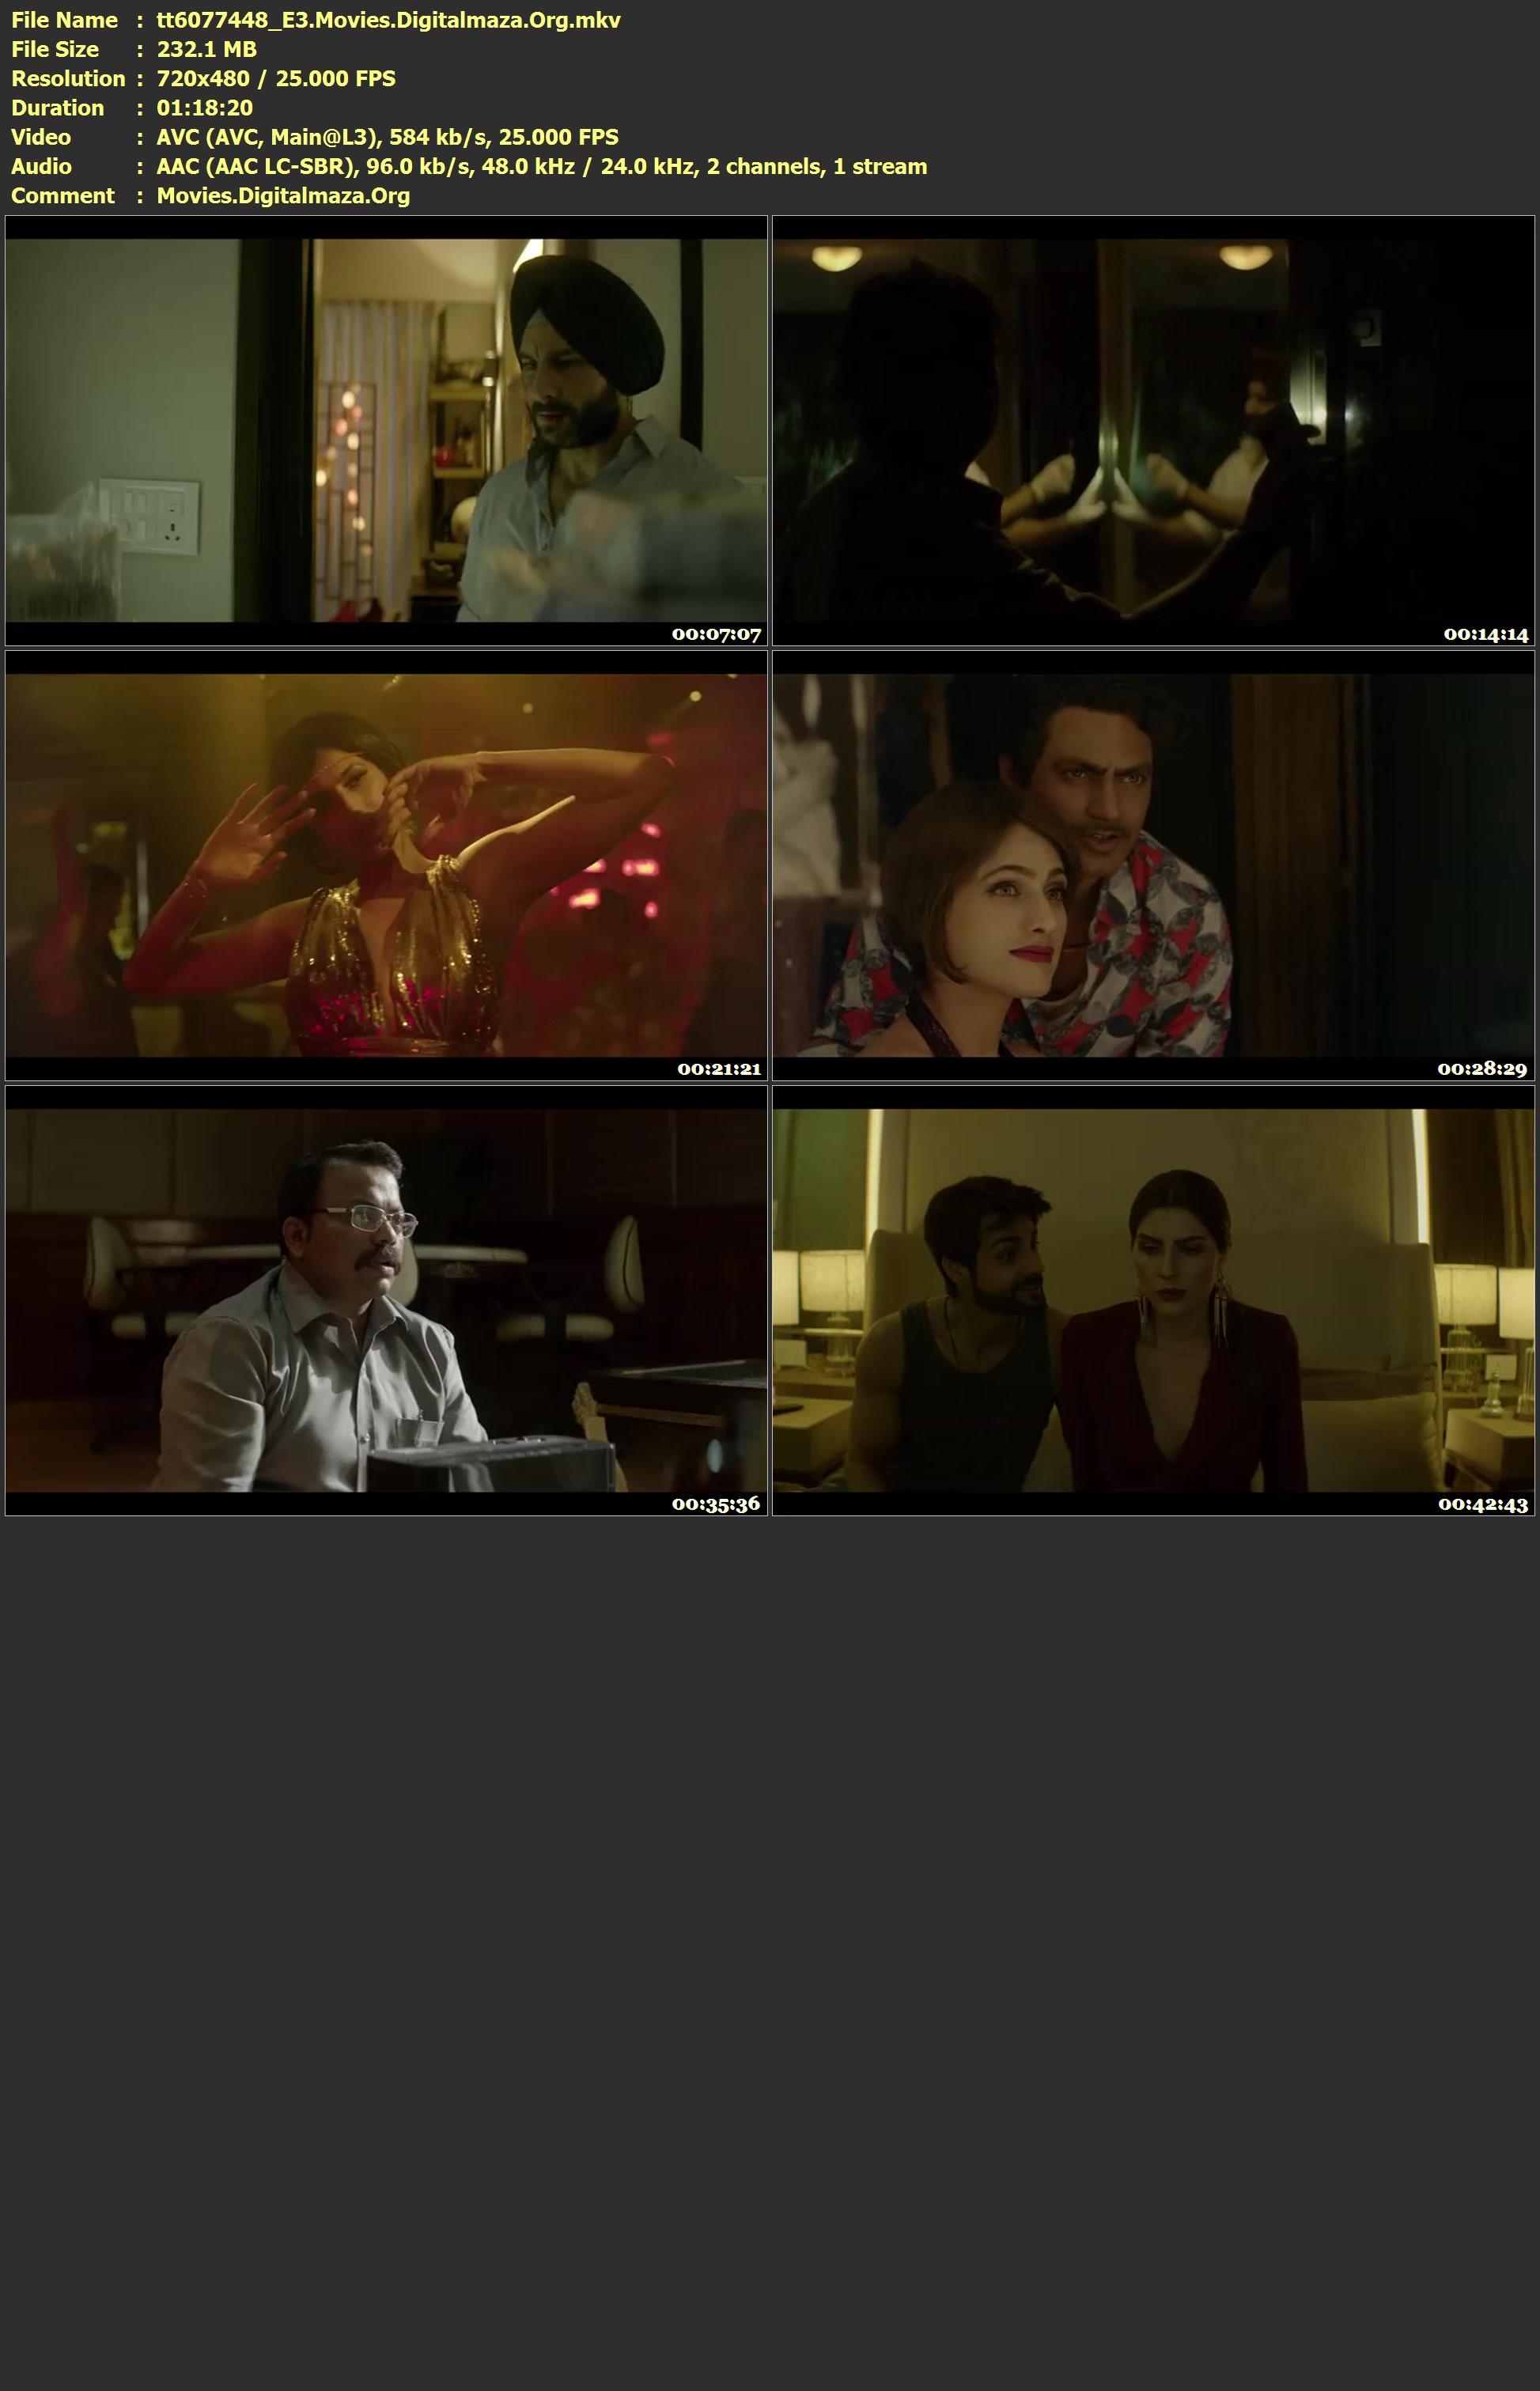 https://image.ibb.co/d8hh2J/tt6077448_E3_Movies_Digitalmaza_Org_mkv.jpg